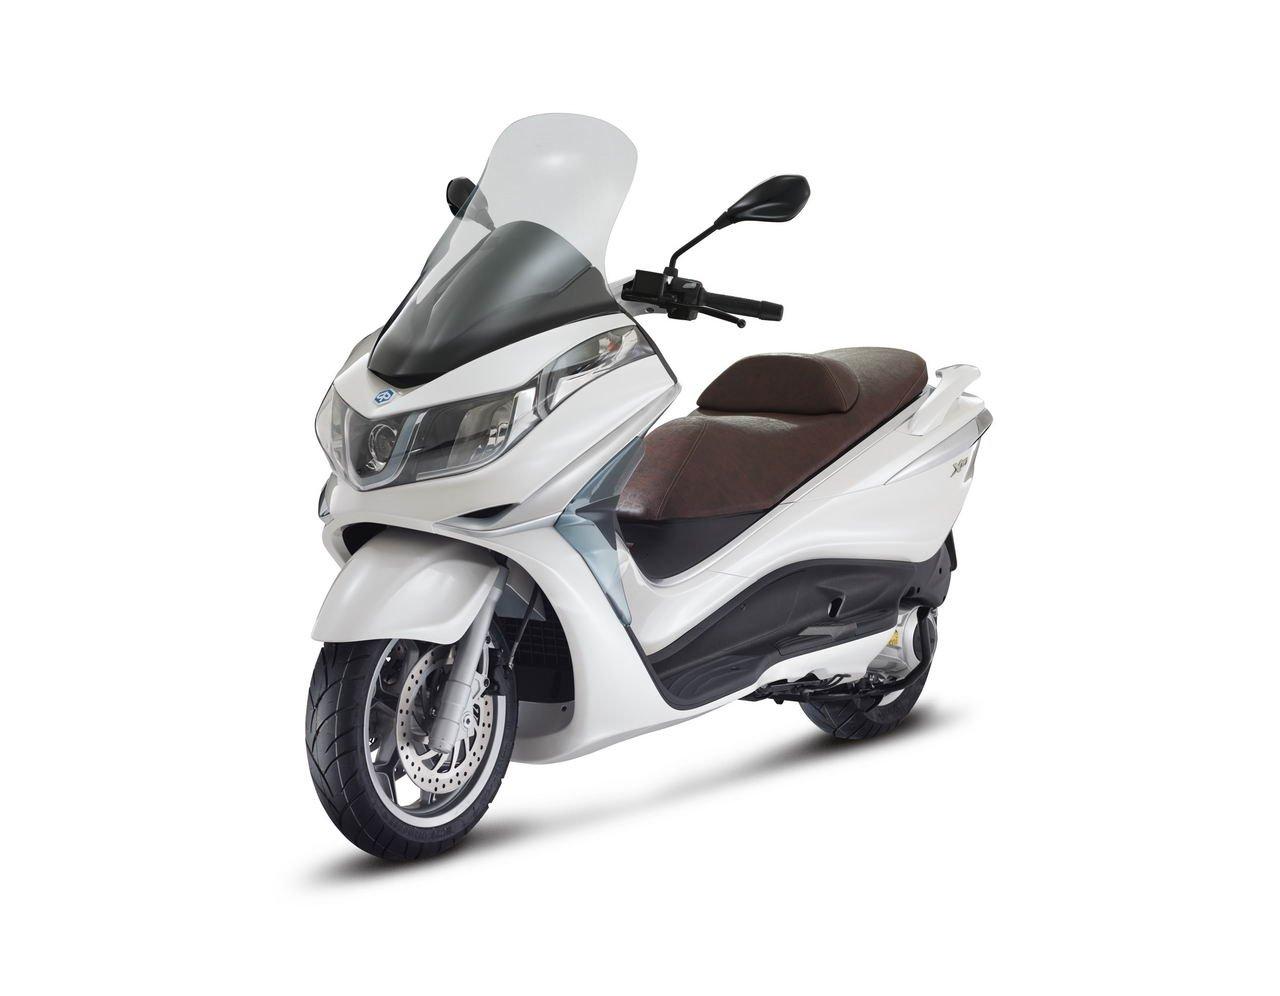 Listino Piaggio Beverly Sport Touring 350 ie Scooter oltre 300 - image 15143_piaggio-x10-executive-350 on http://moto.motori.net